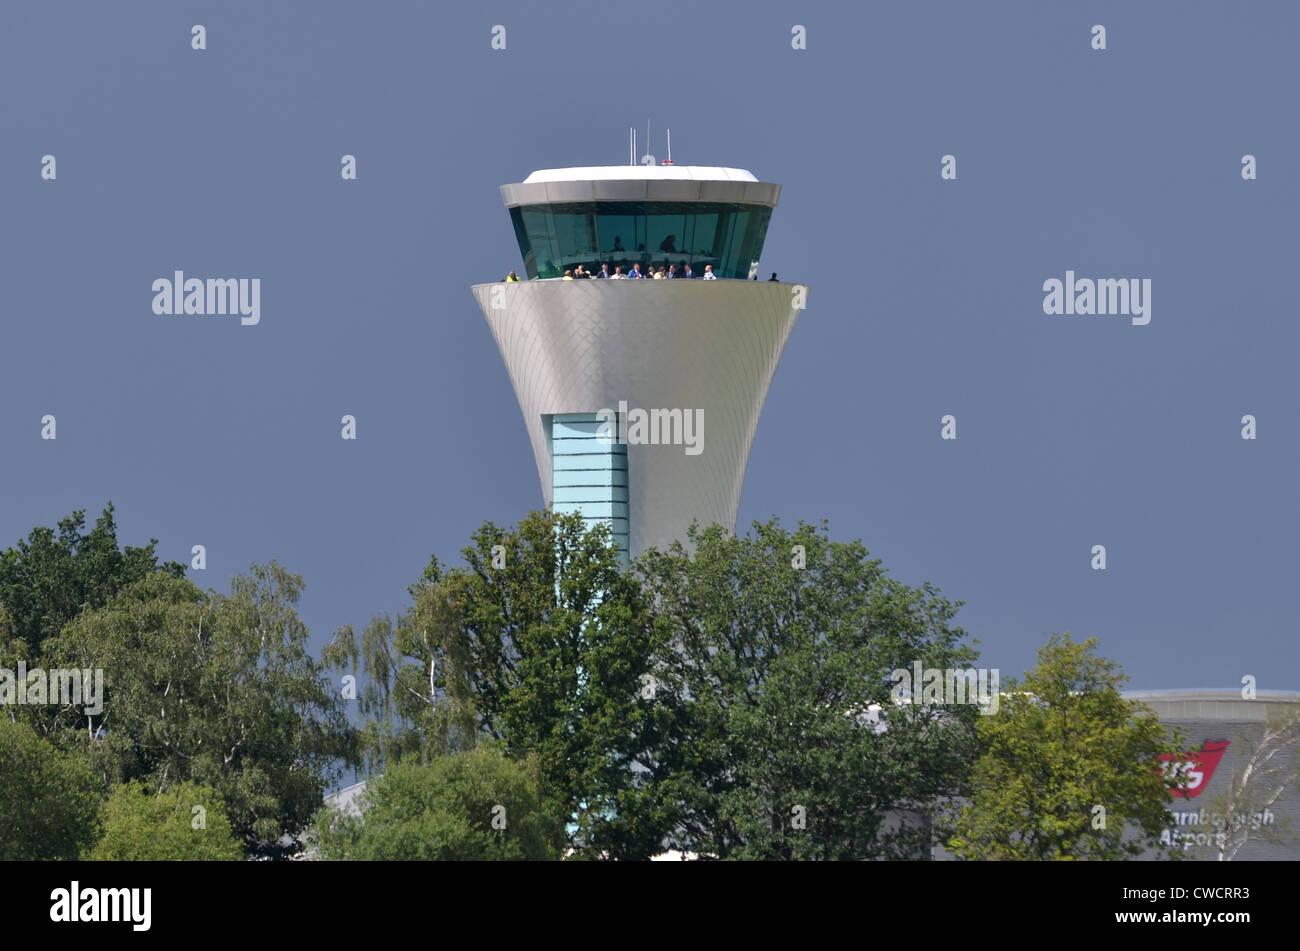 Control Tower, Farnborough Airport, UK - Stock Image